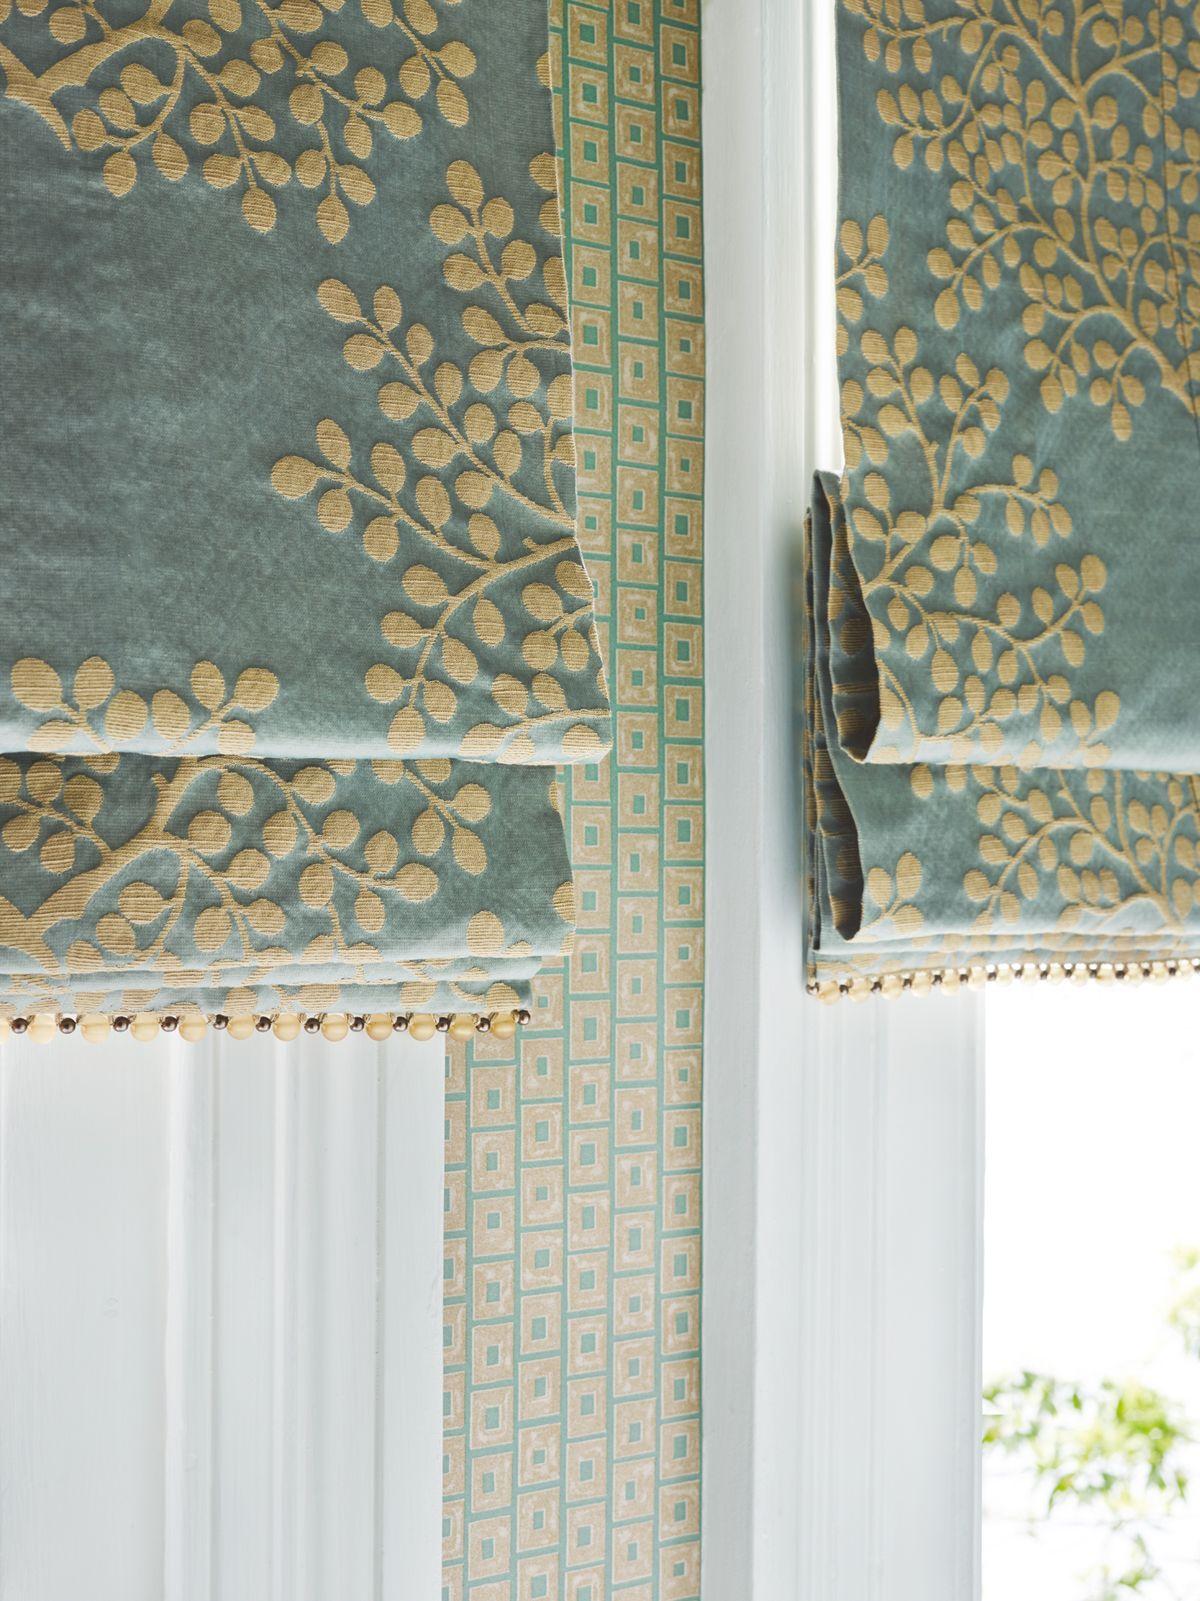 1d73dc9107749922c09e5683c8d715e4 Jpg 1 200 1 601 Pixels Fabric Window Treatments Diy Window Treatments Custom Roman Shades